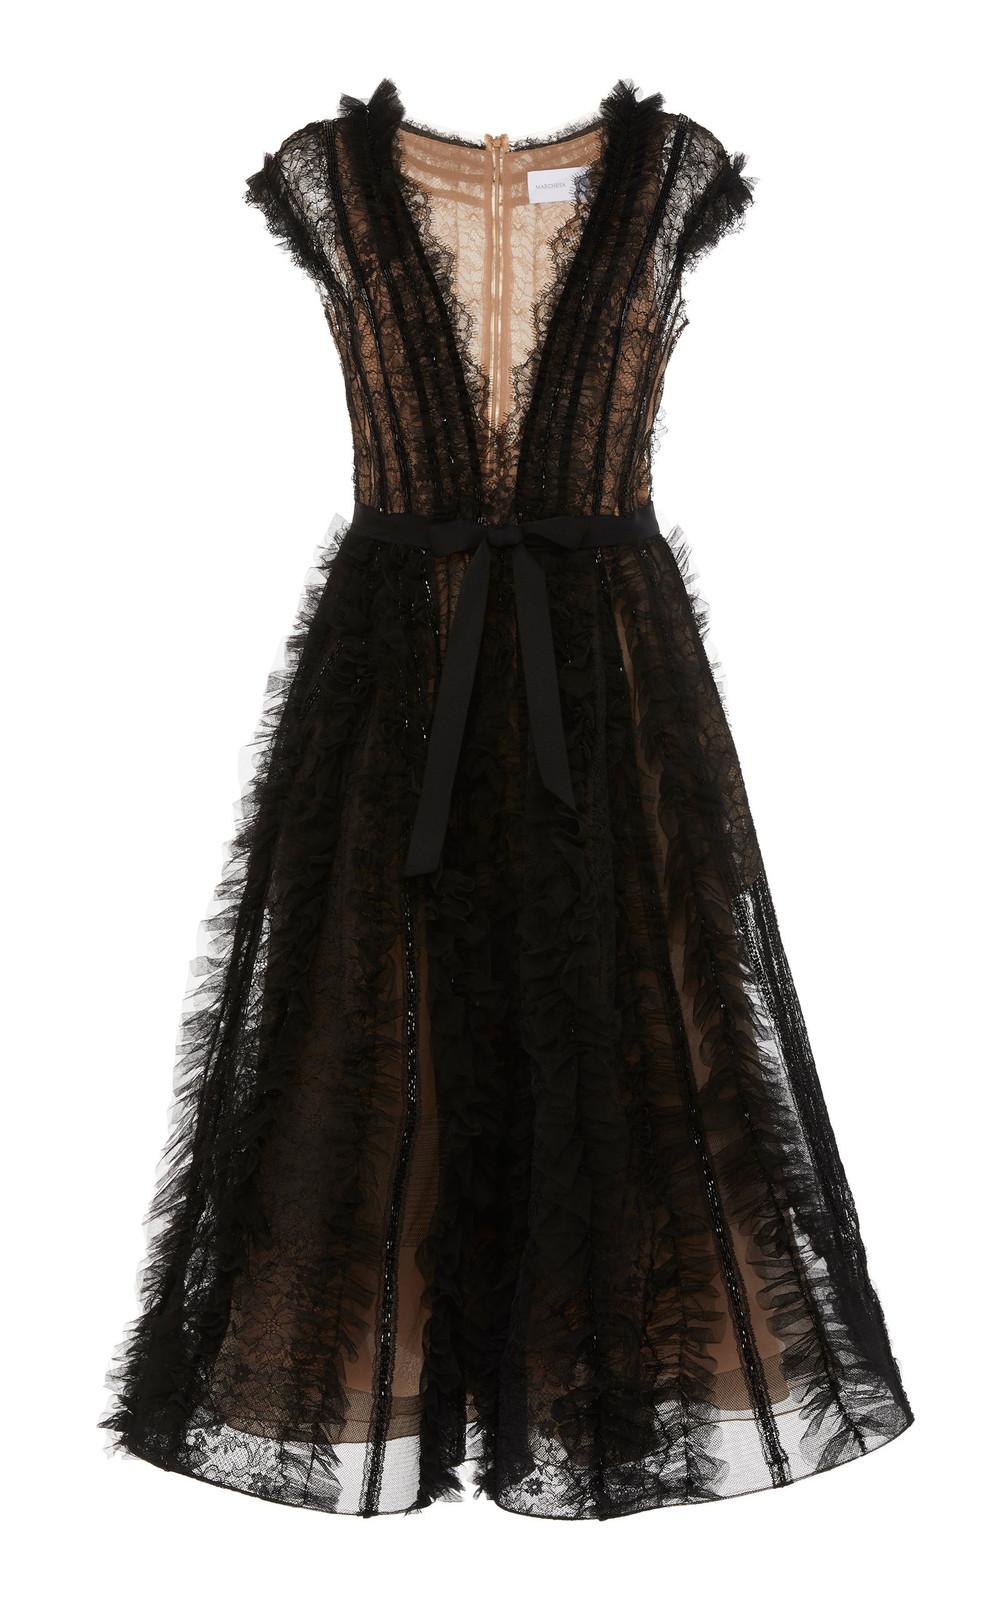 Marchesa A-Line Tulle Midi Dress in black